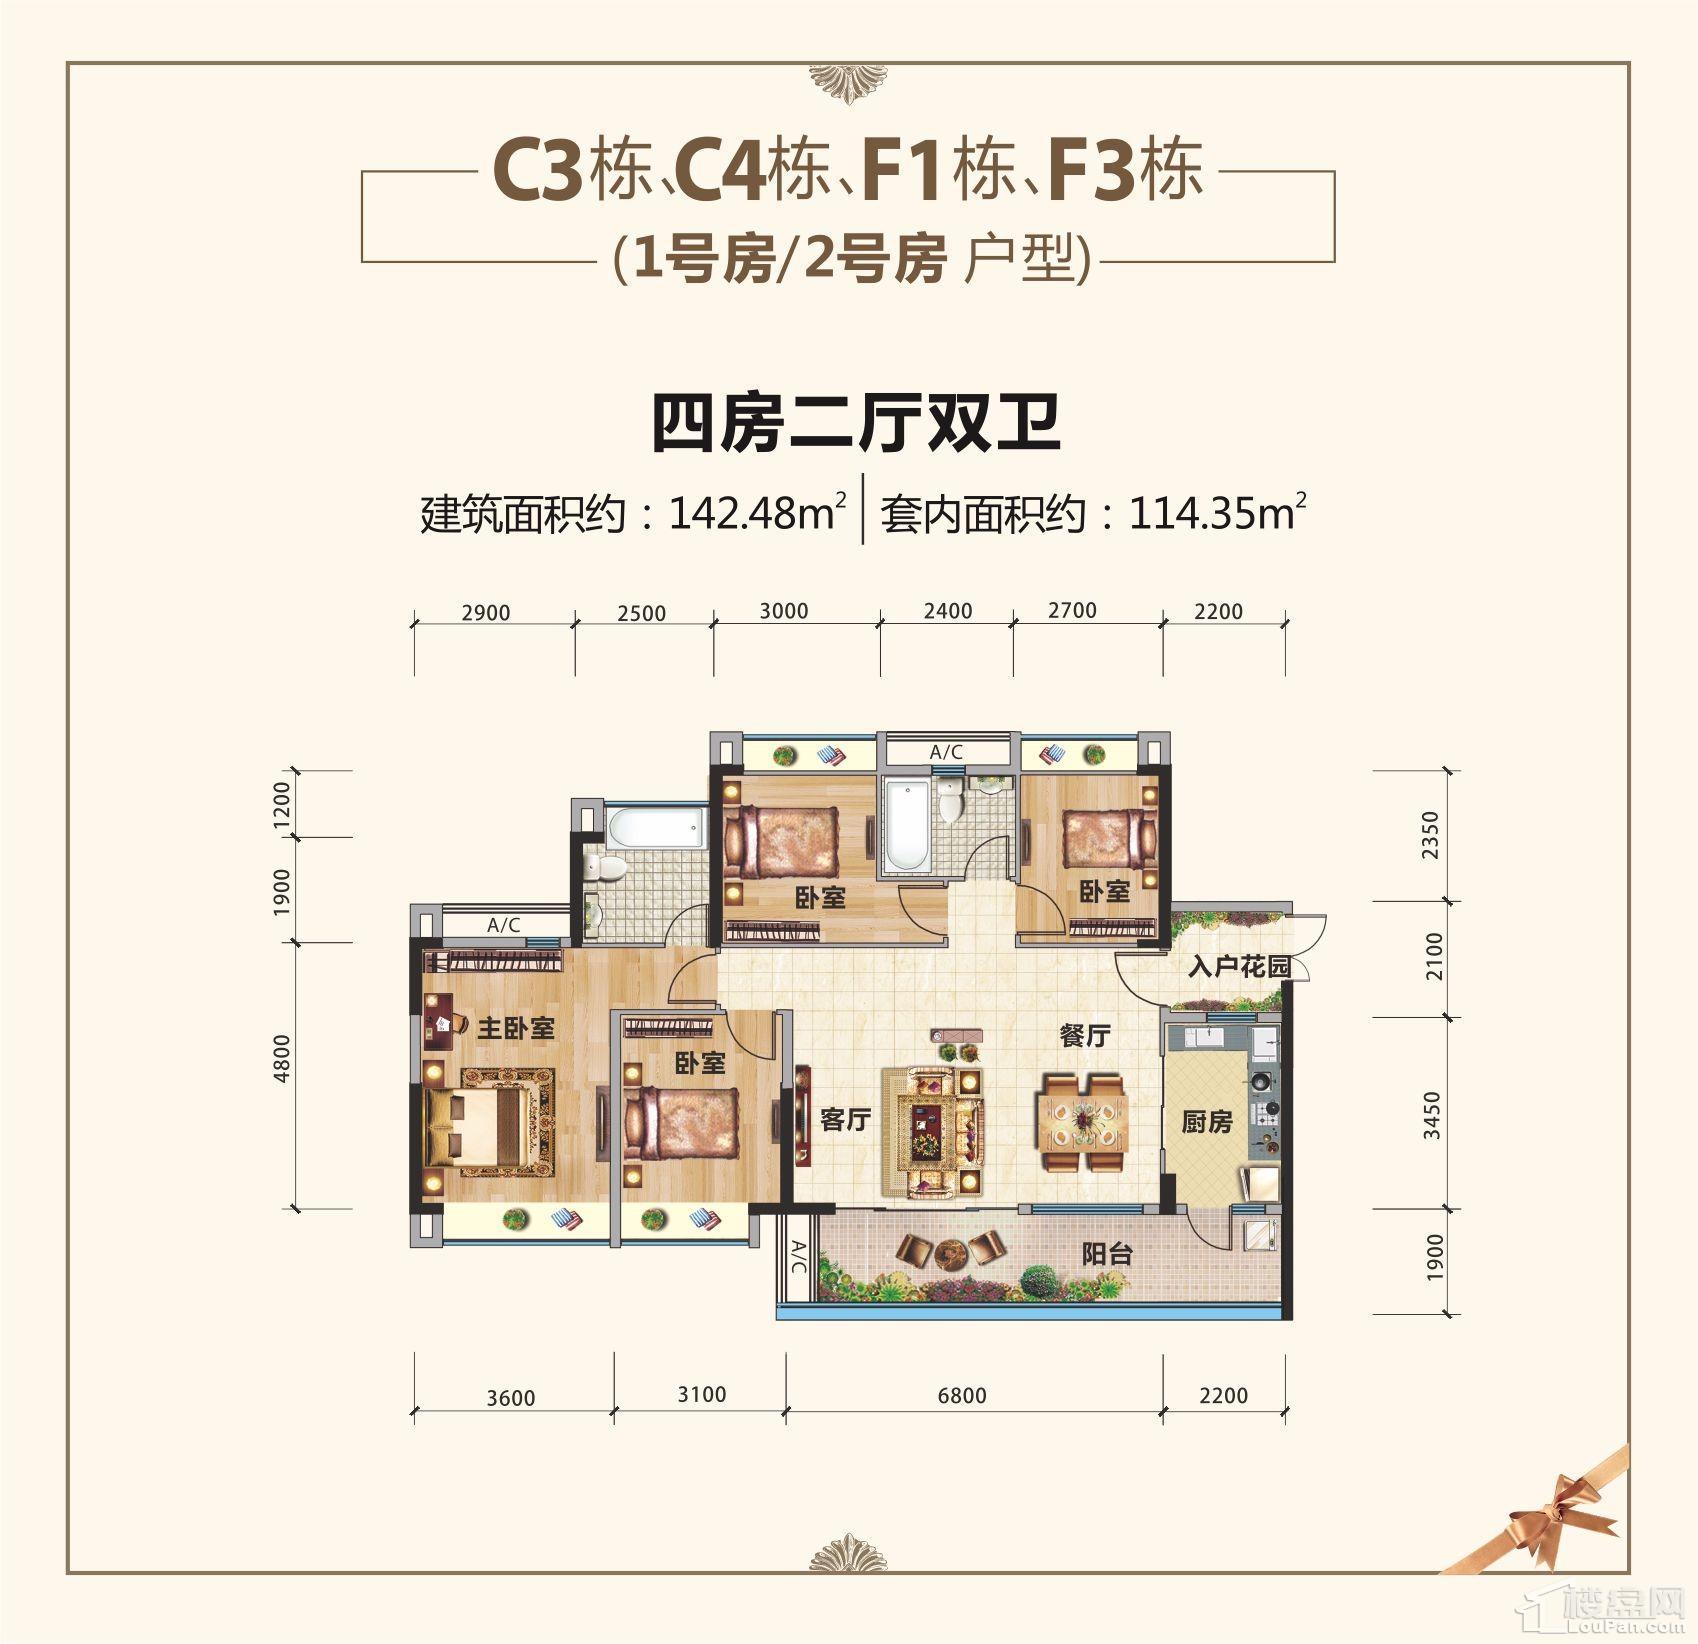 C3栋、C4栋、F1栋、F3栋1号房/2号房户型